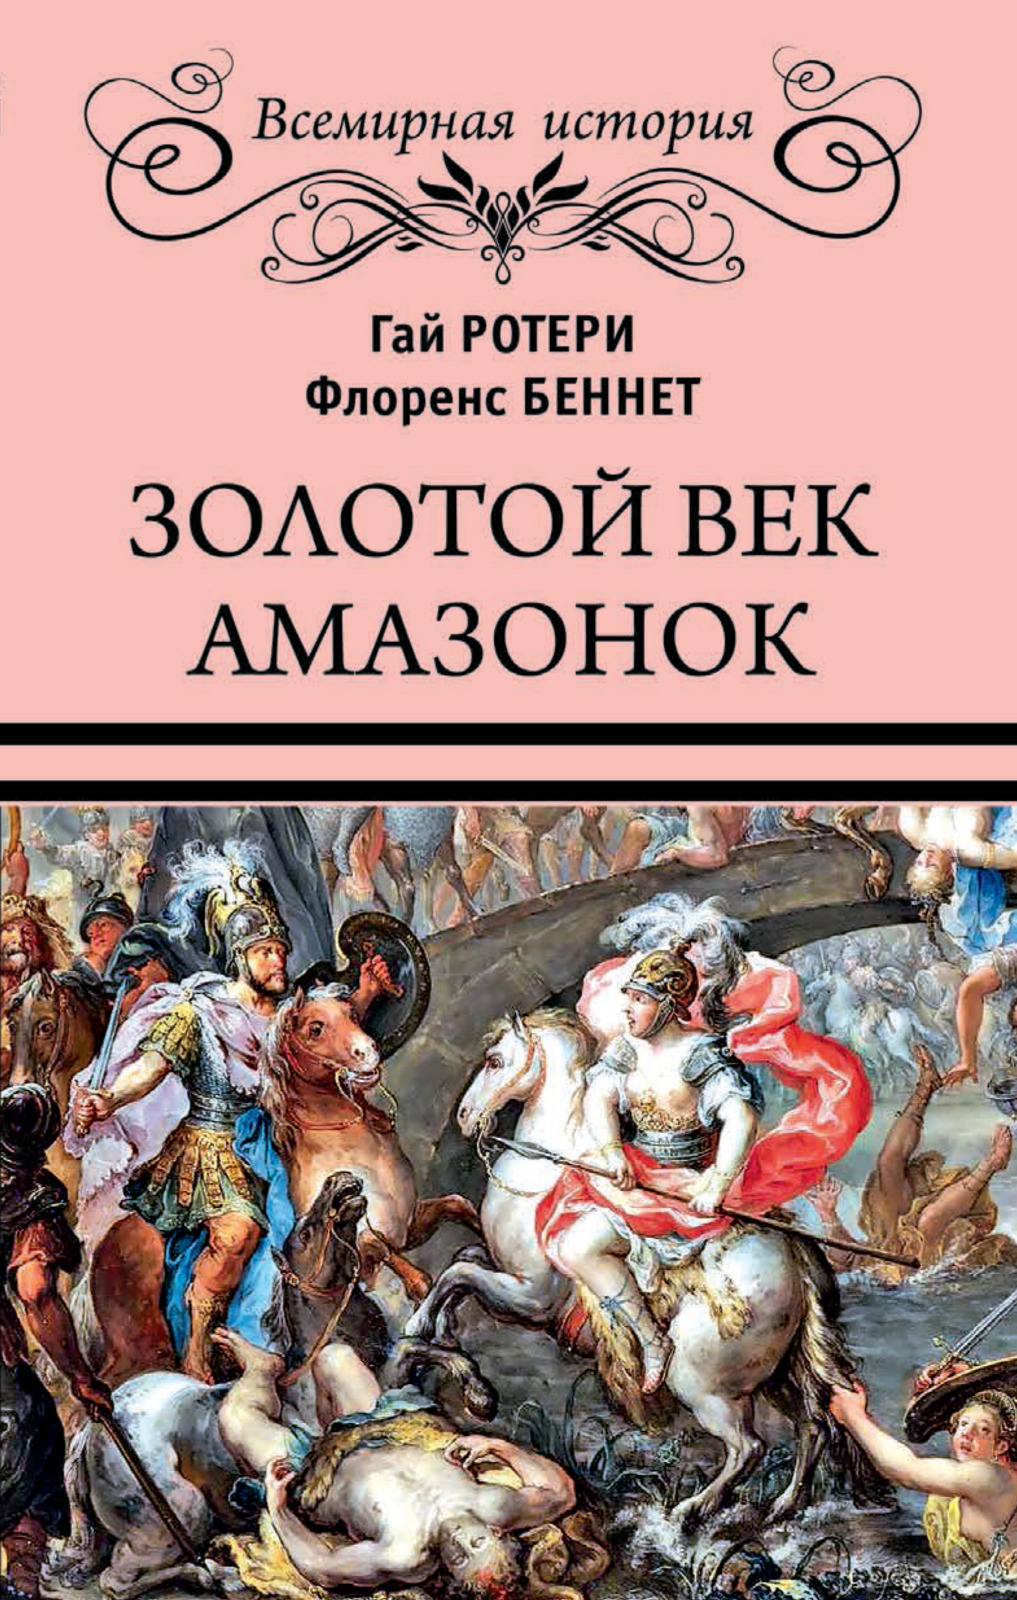 Гай Ротери, Флоренс Беннет Золотой век амазонок